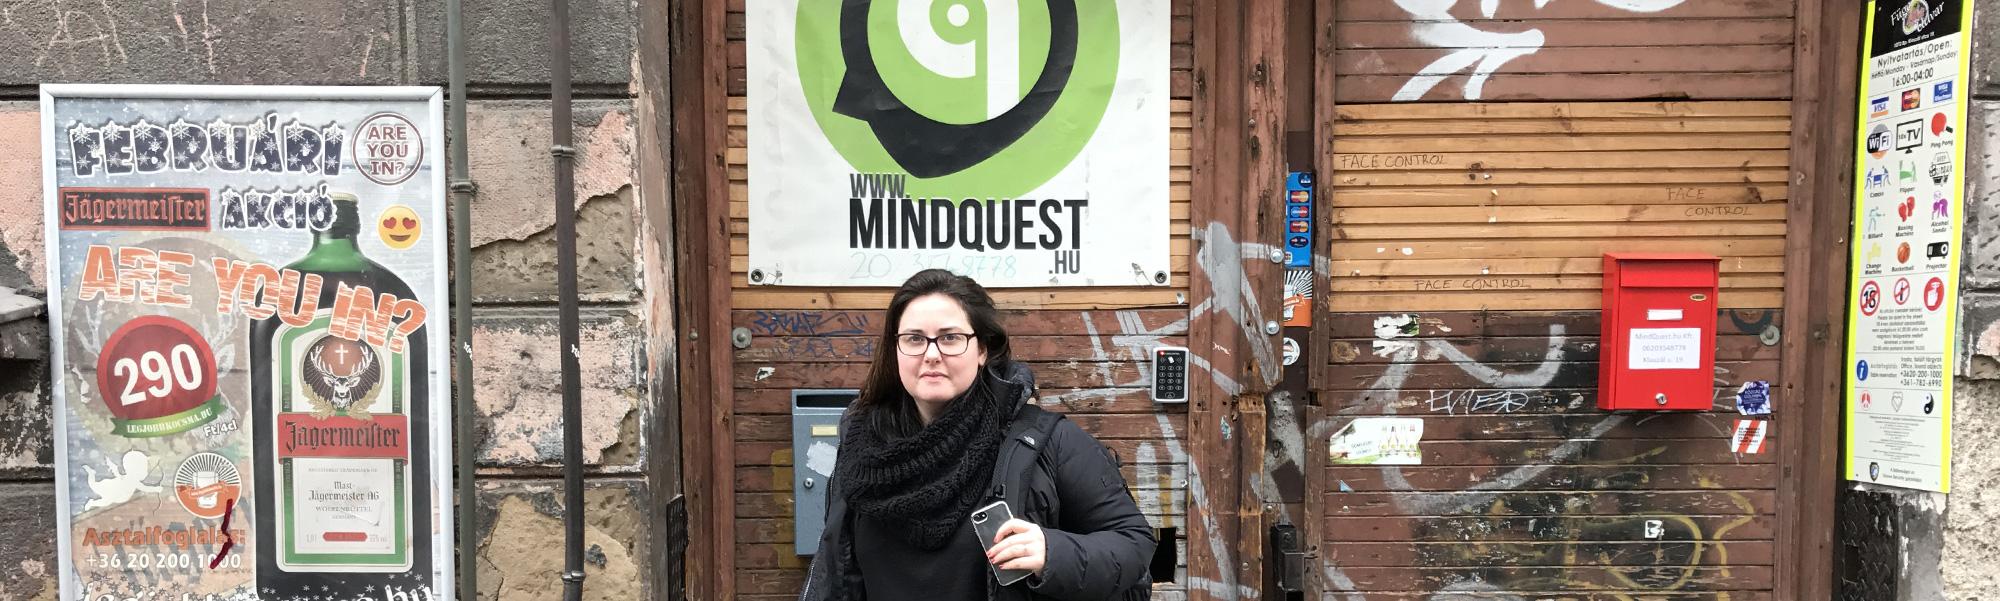 Mindquest Budapest